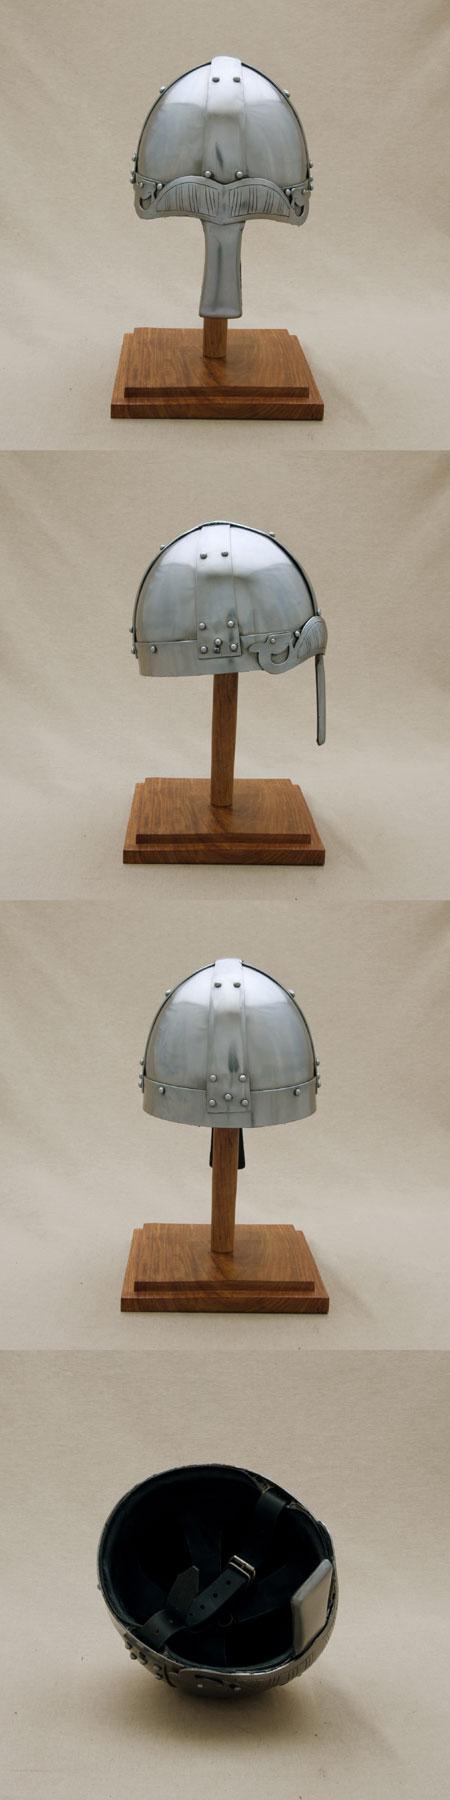 Starker Helm Wikinger - Normannen, um 900 AD